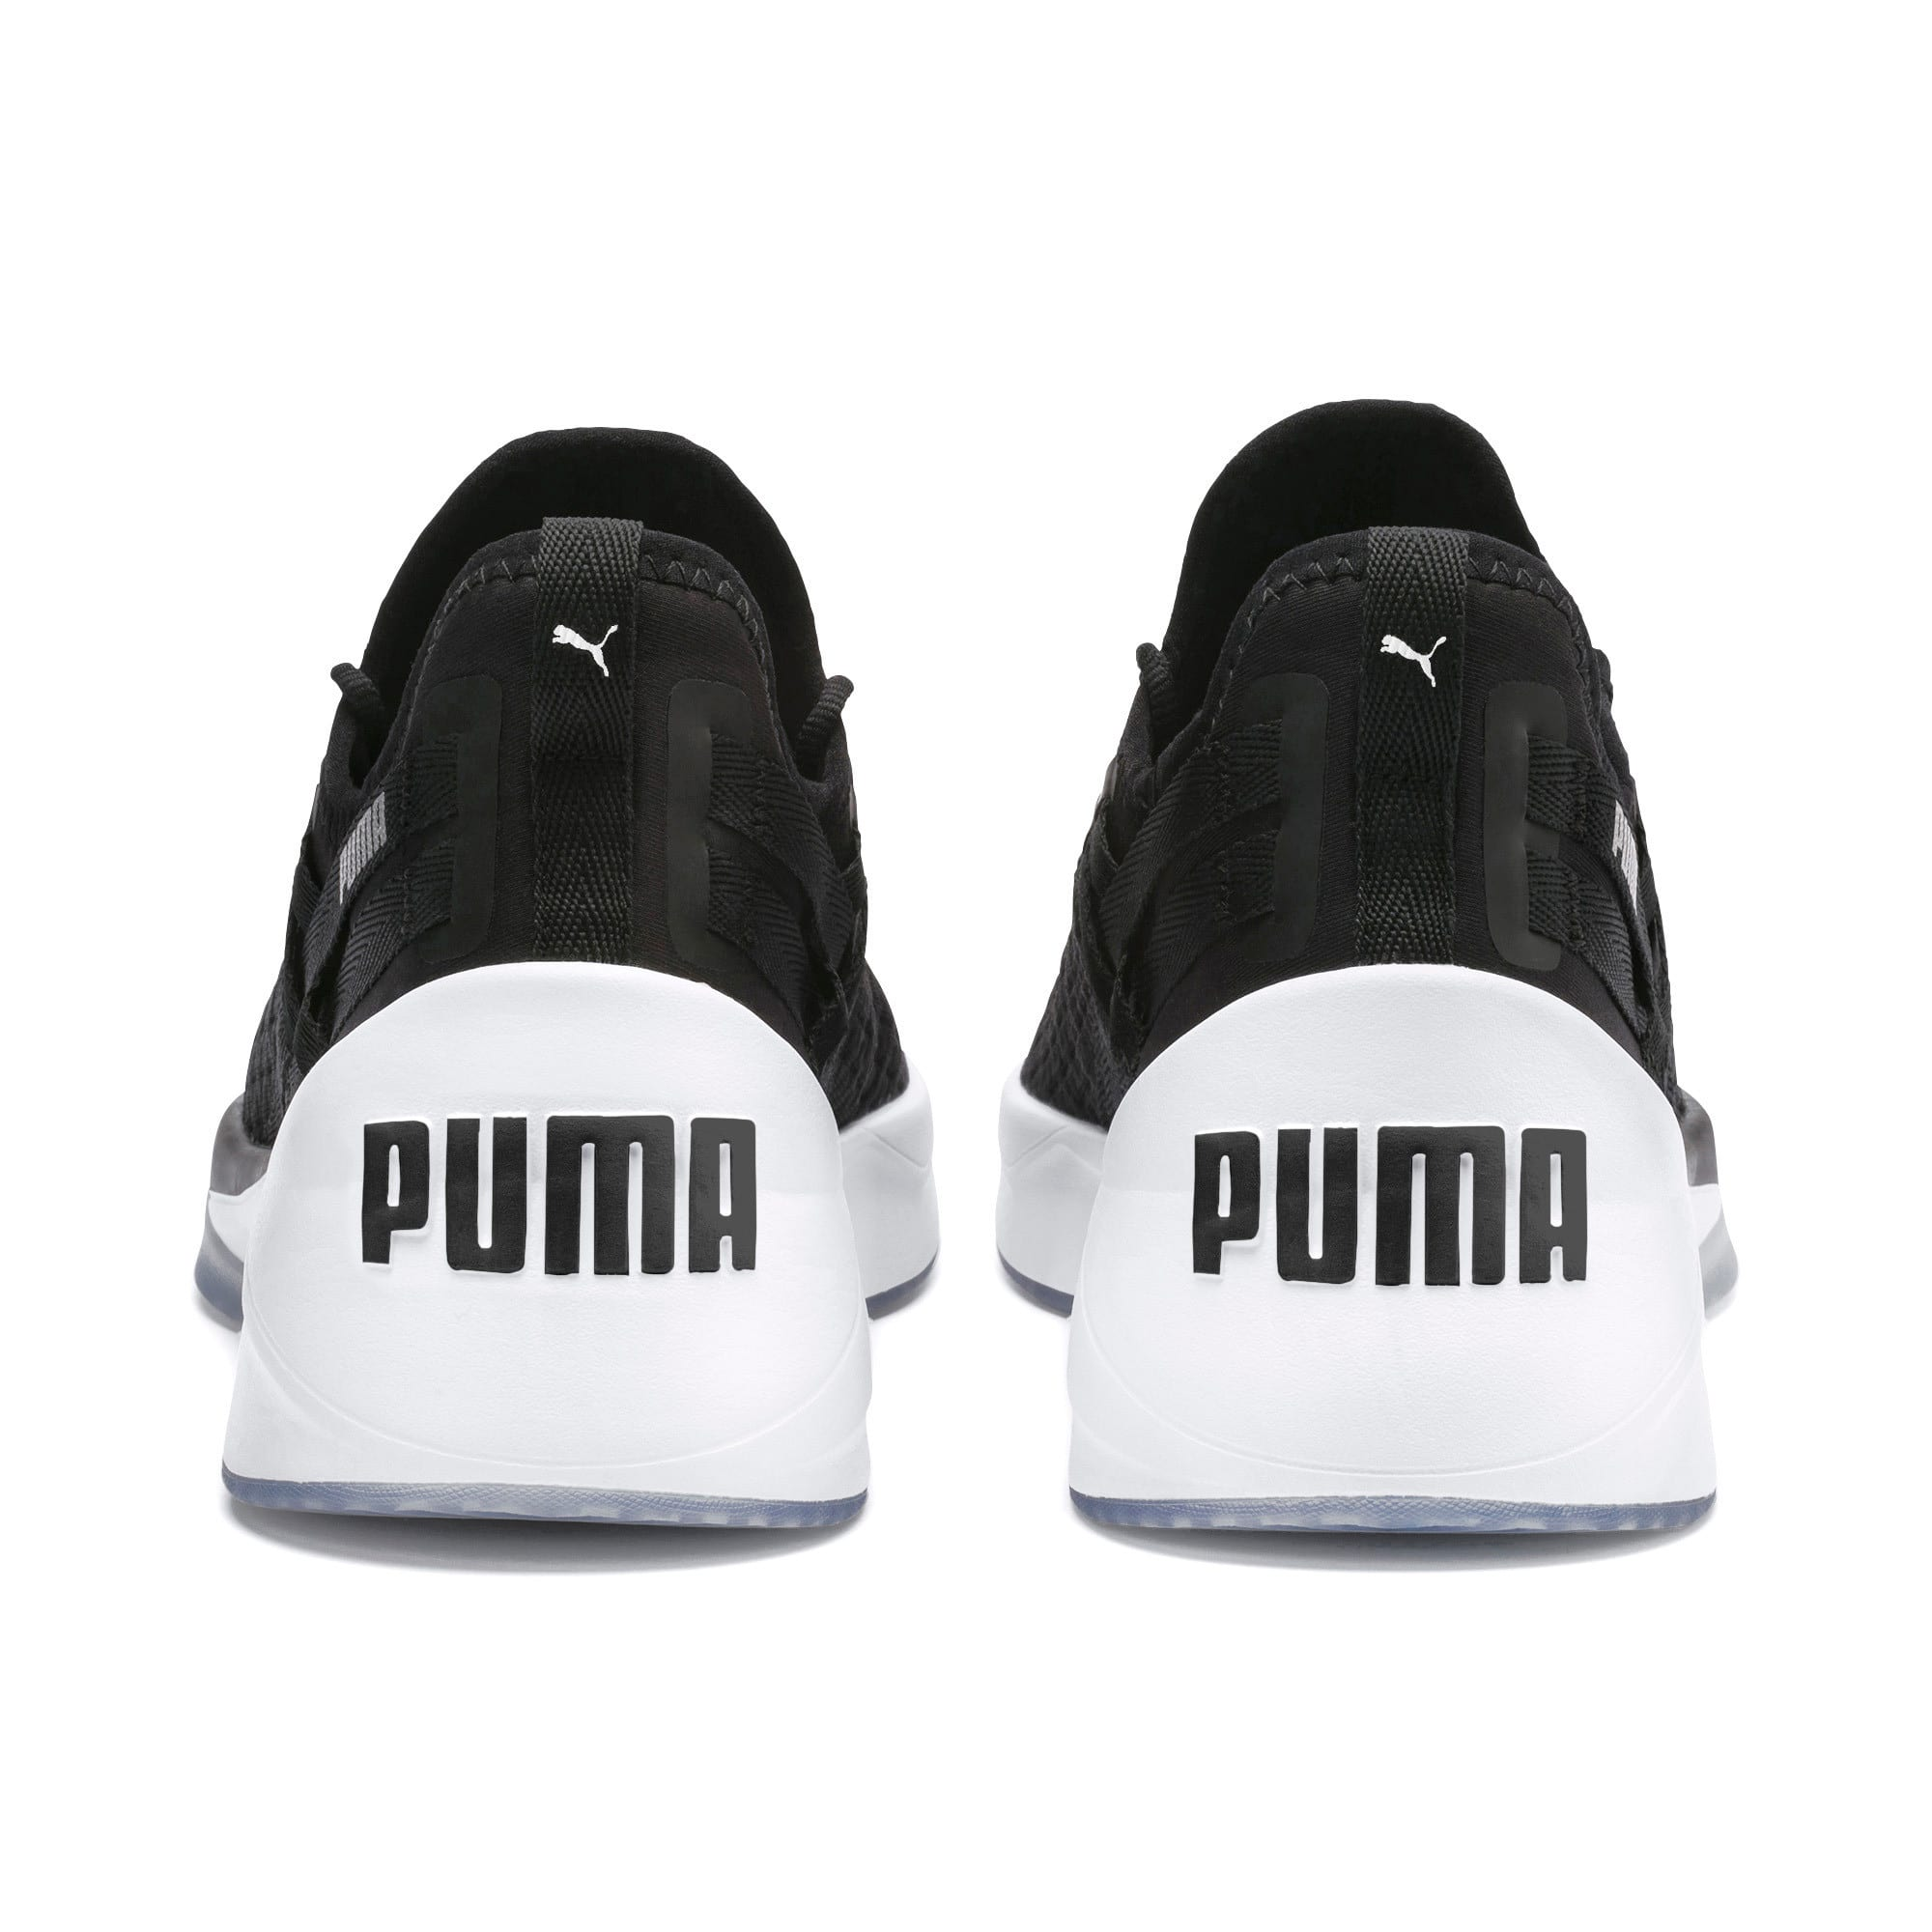 Thumbnail 3 of Jaab XT Women's Training Shoes, Puma Black-Puma White, medium